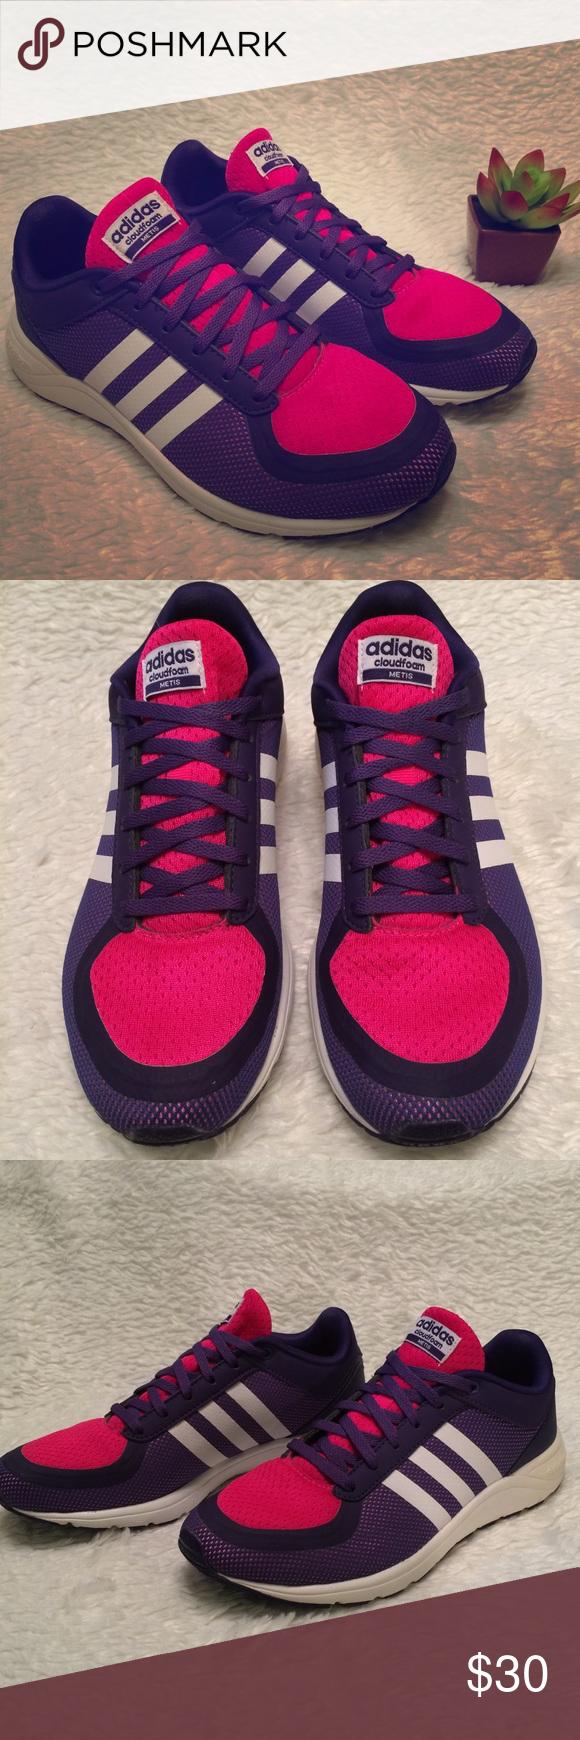 Adidas neo cloudfoam meti sz 7 viola / rosa pinterest adidas